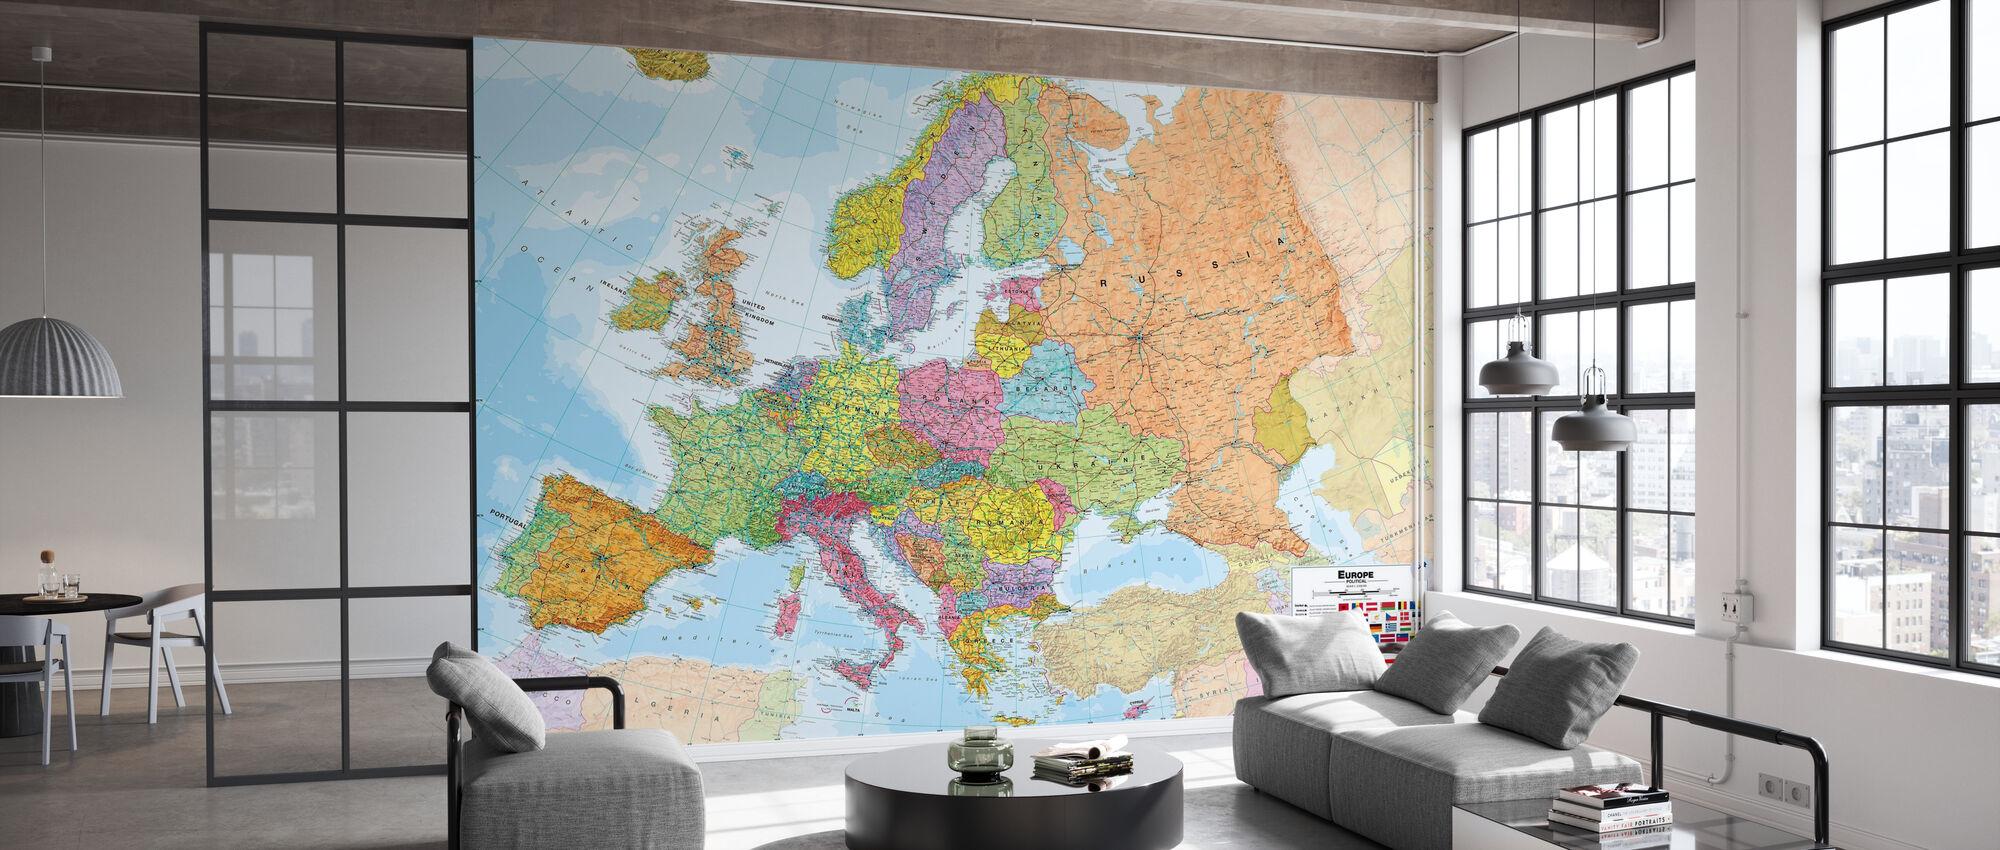 Political Europe Map - Wallpaper - Office